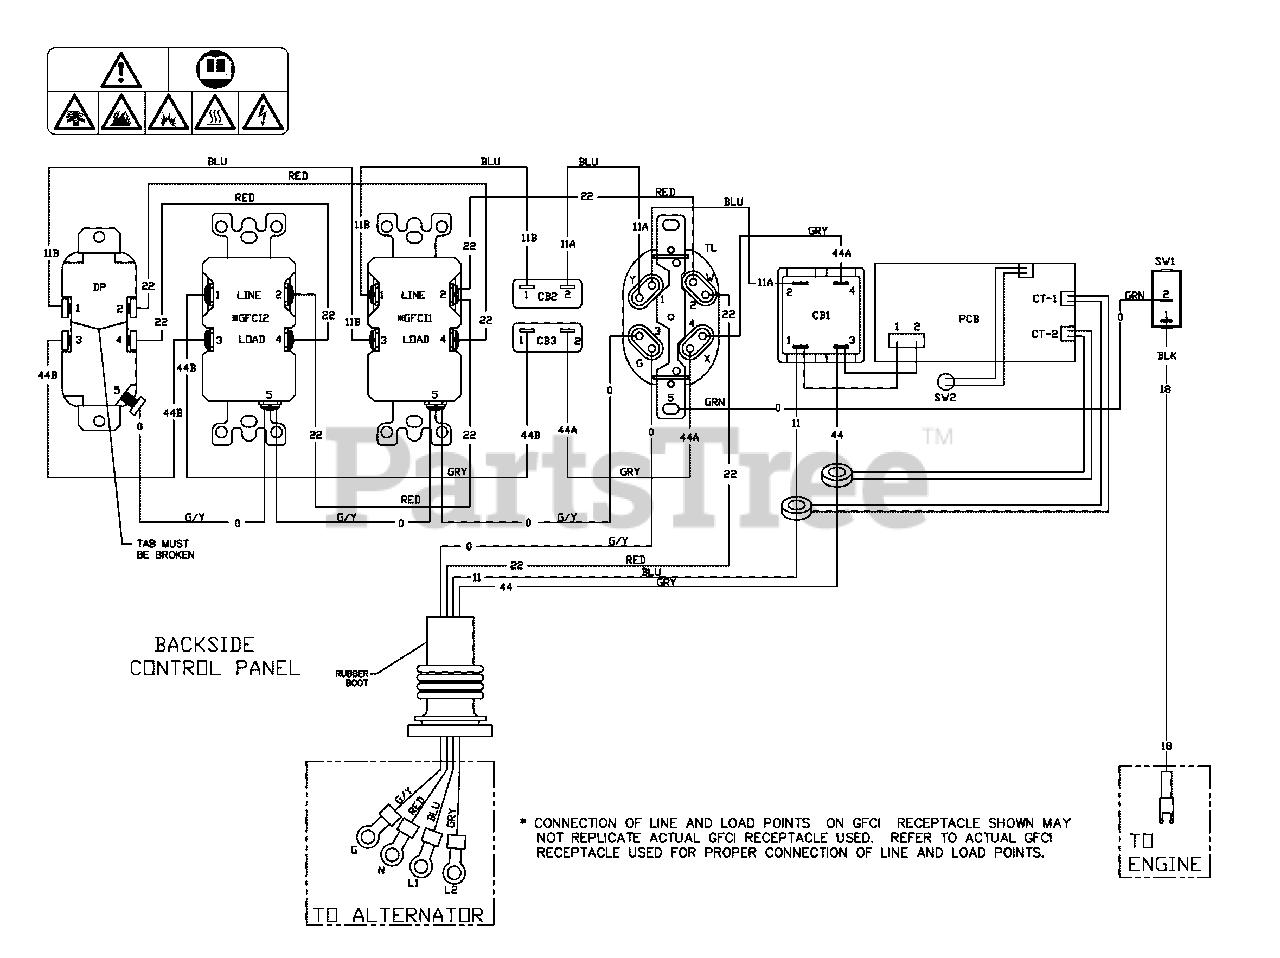 [DIAGRAM_38EU]  Briggs & Stratton 030592H-00 - Briggs & Stratton 6,250 Watt Portable  Generator Wiring Diagram (80016133WD) Parts Lookup with Diagrams   PartsTree   Briggs Stratton Engine Diagram Chainsaw      PartsTree